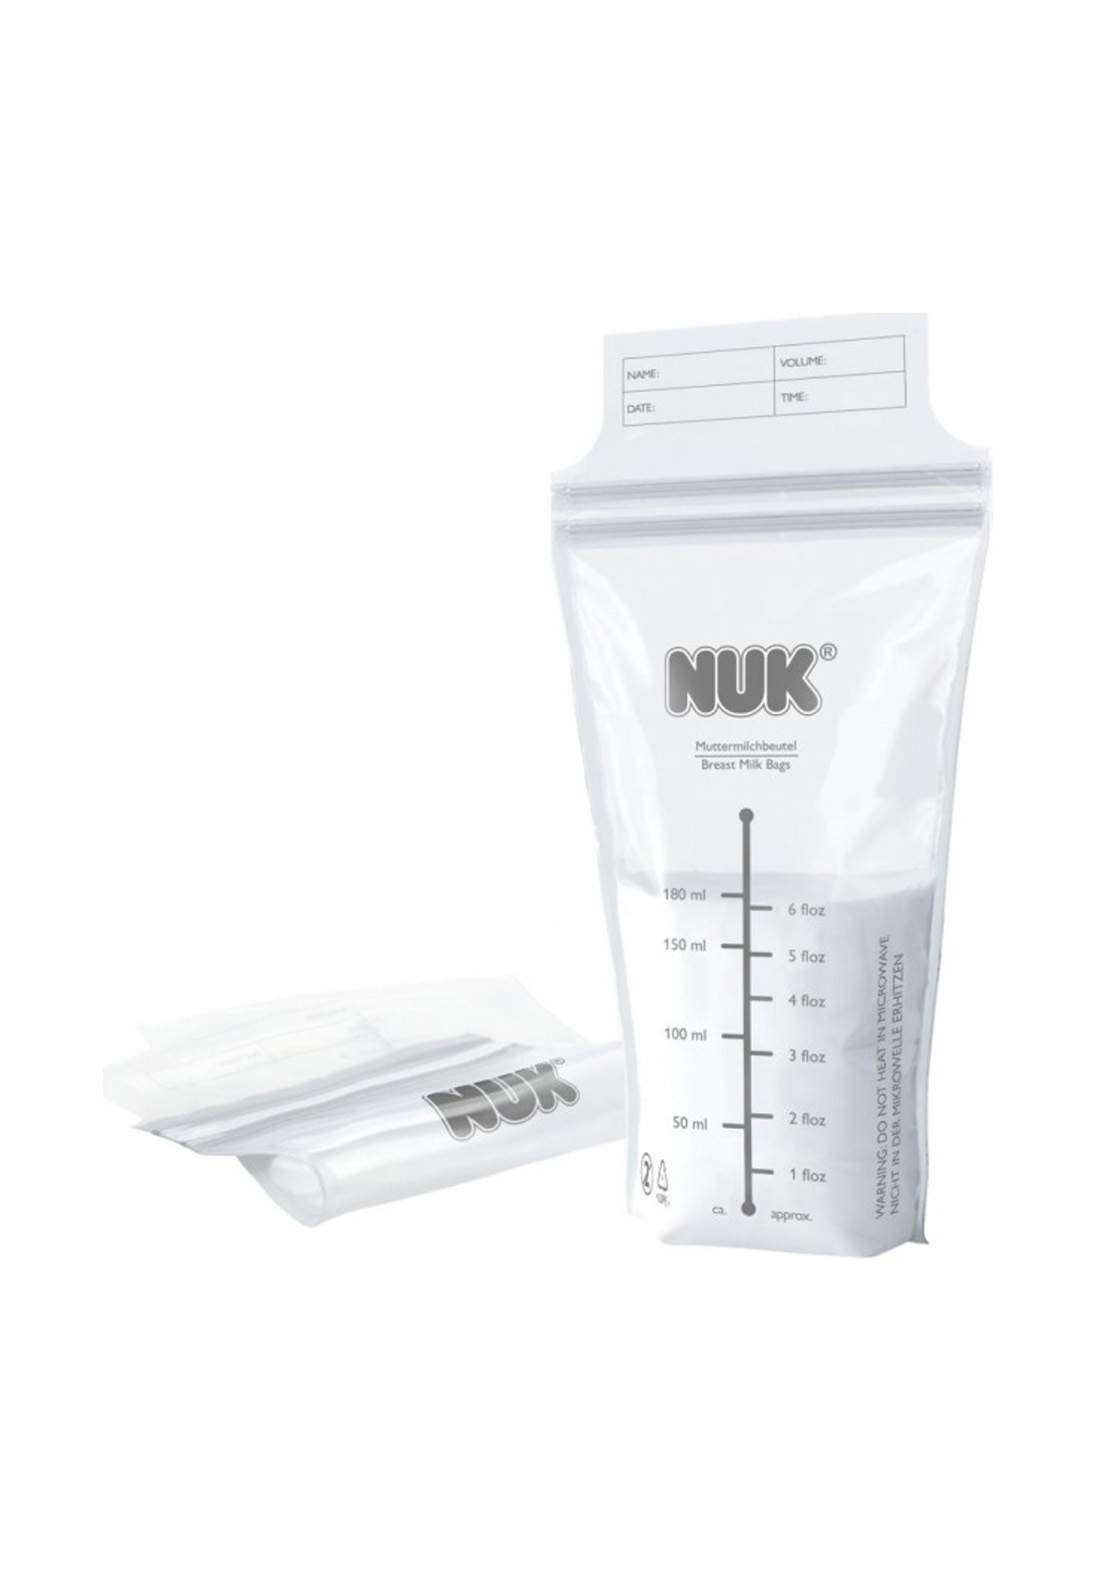 Nuk Breast Milk Bags 25 Pcs حافظة تخزين حليب الأم